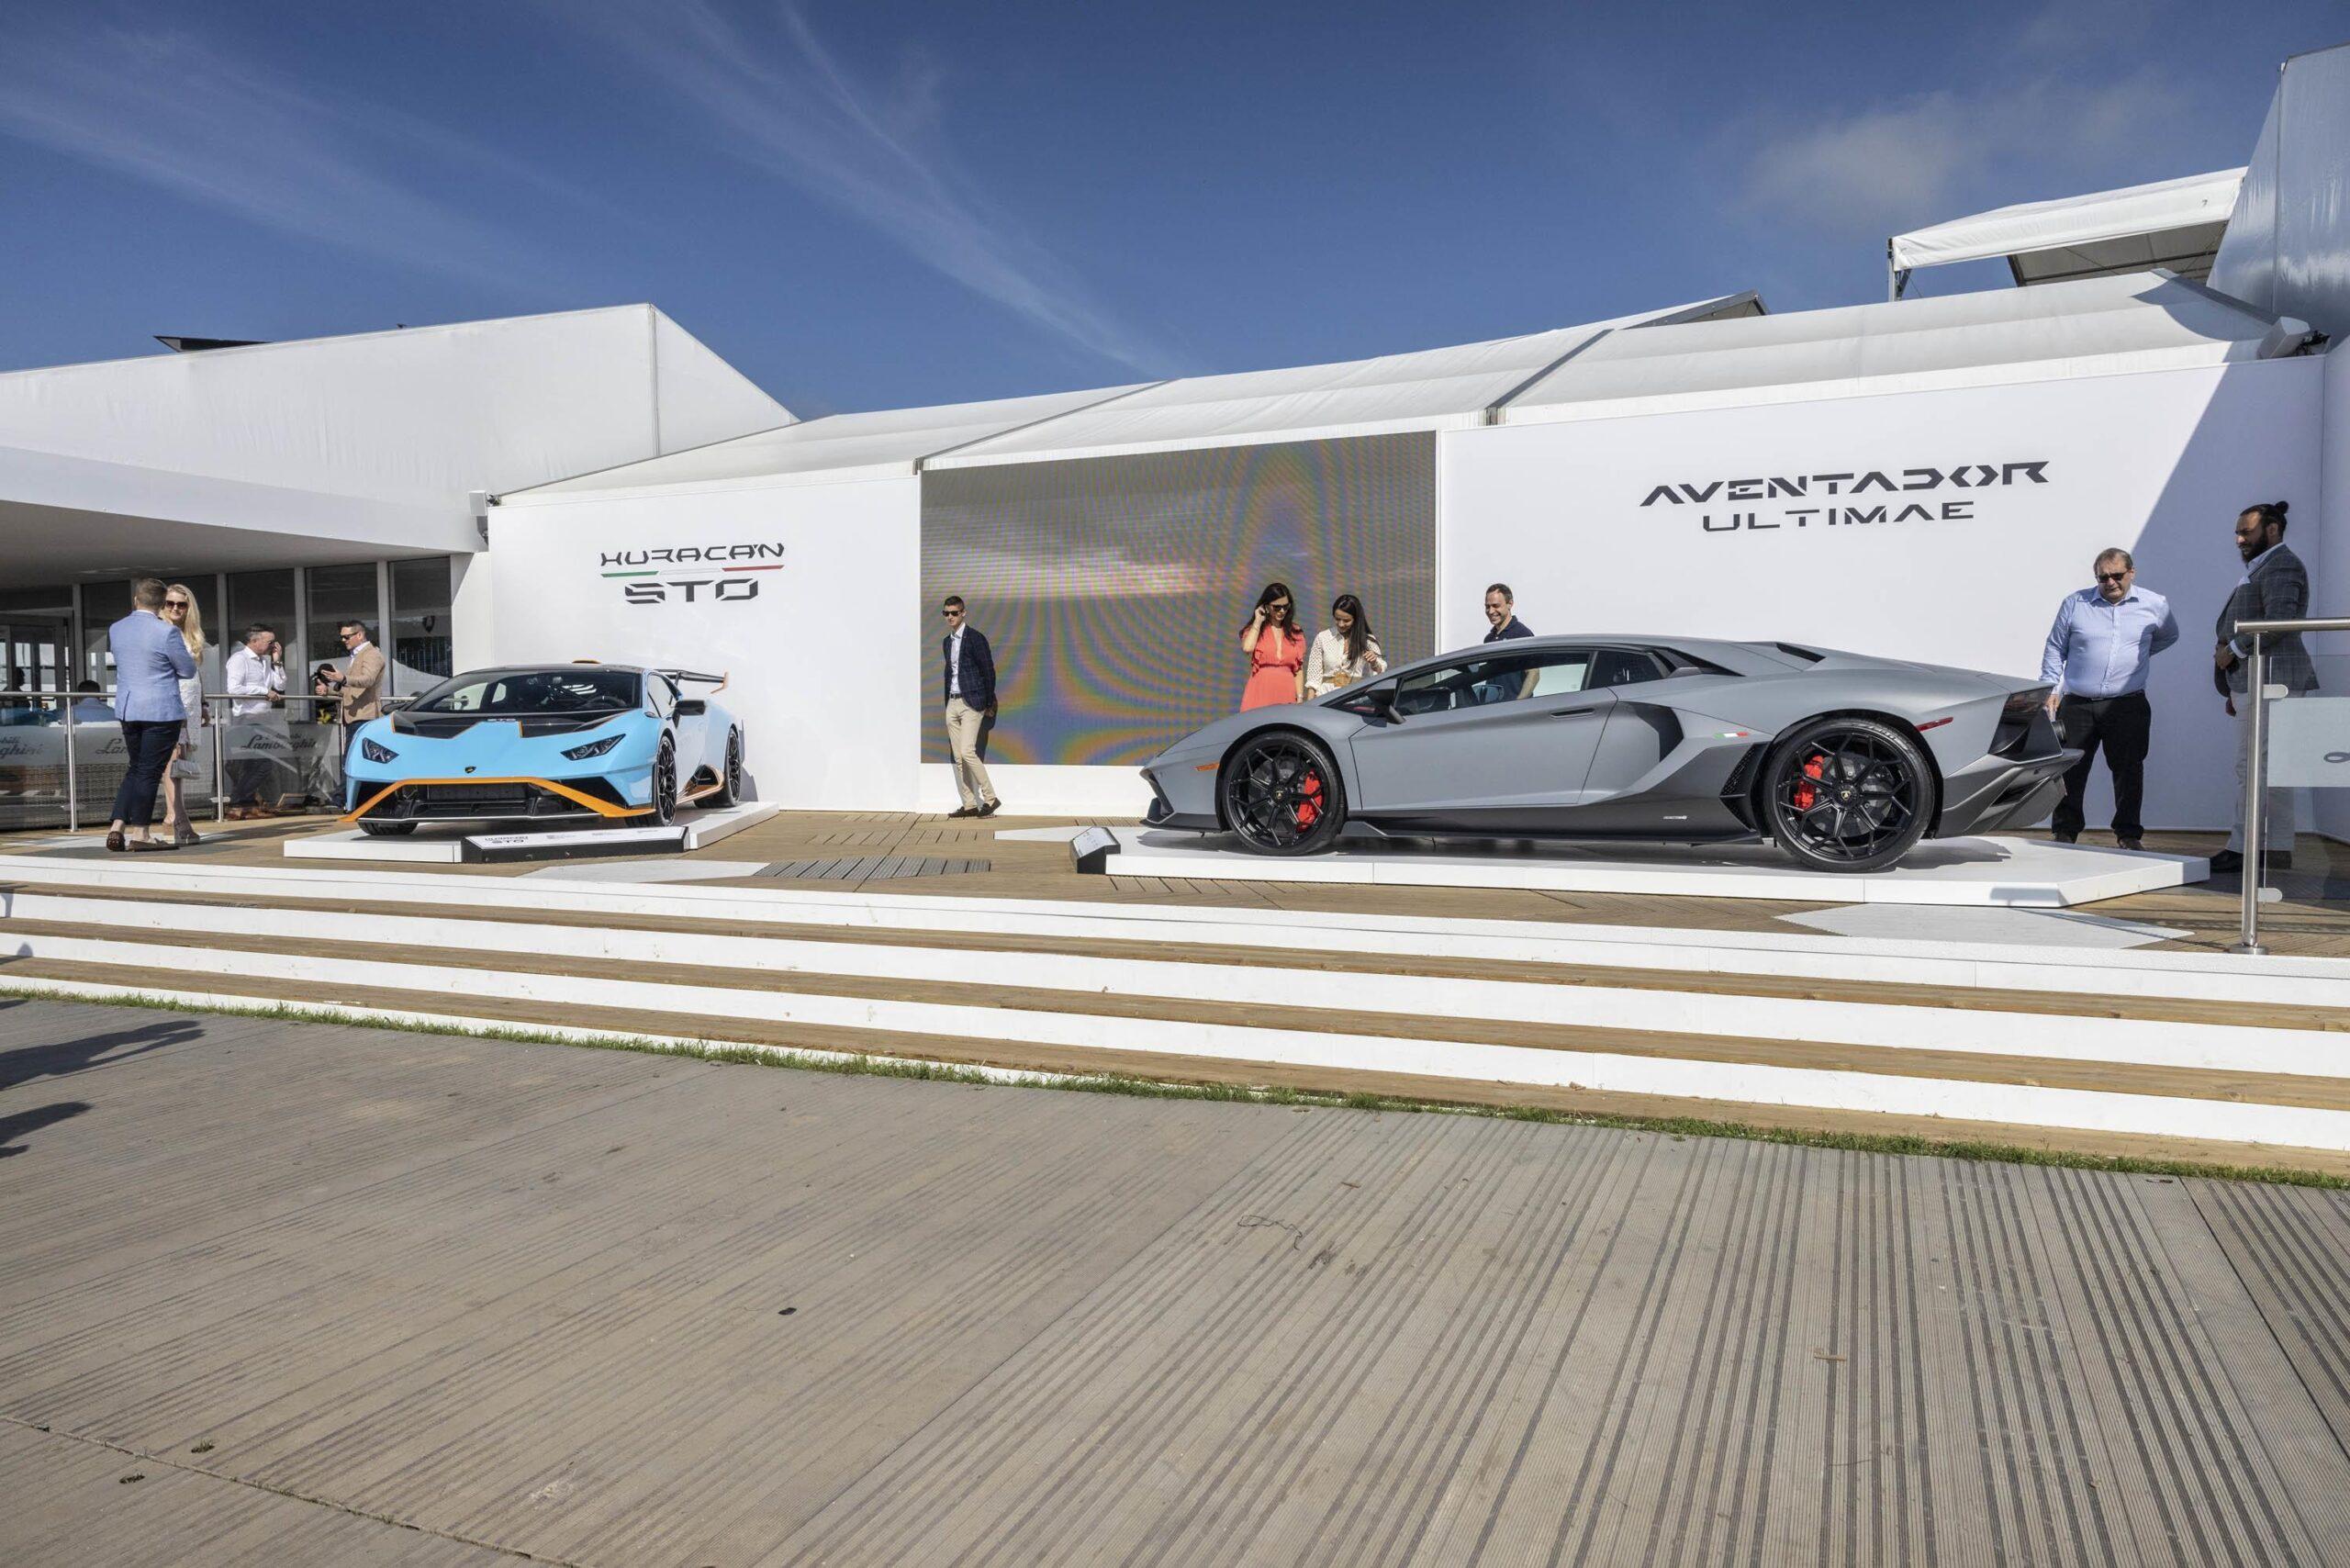 Lamborghini mostra le sue supersportive V12 al Goodwood Festival of Speed